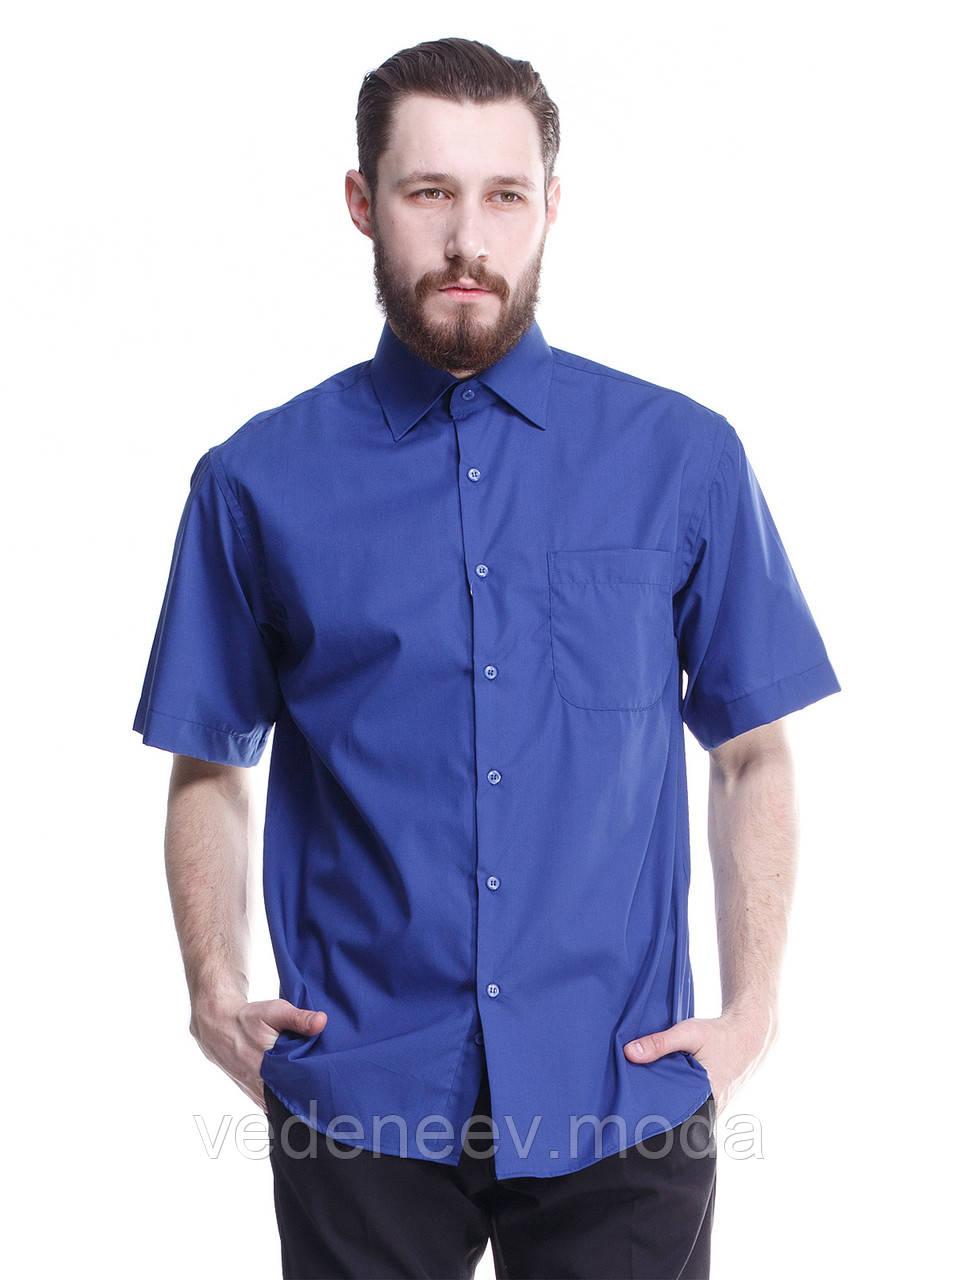 Рубашка мужская синего цвета с коротким рукавом